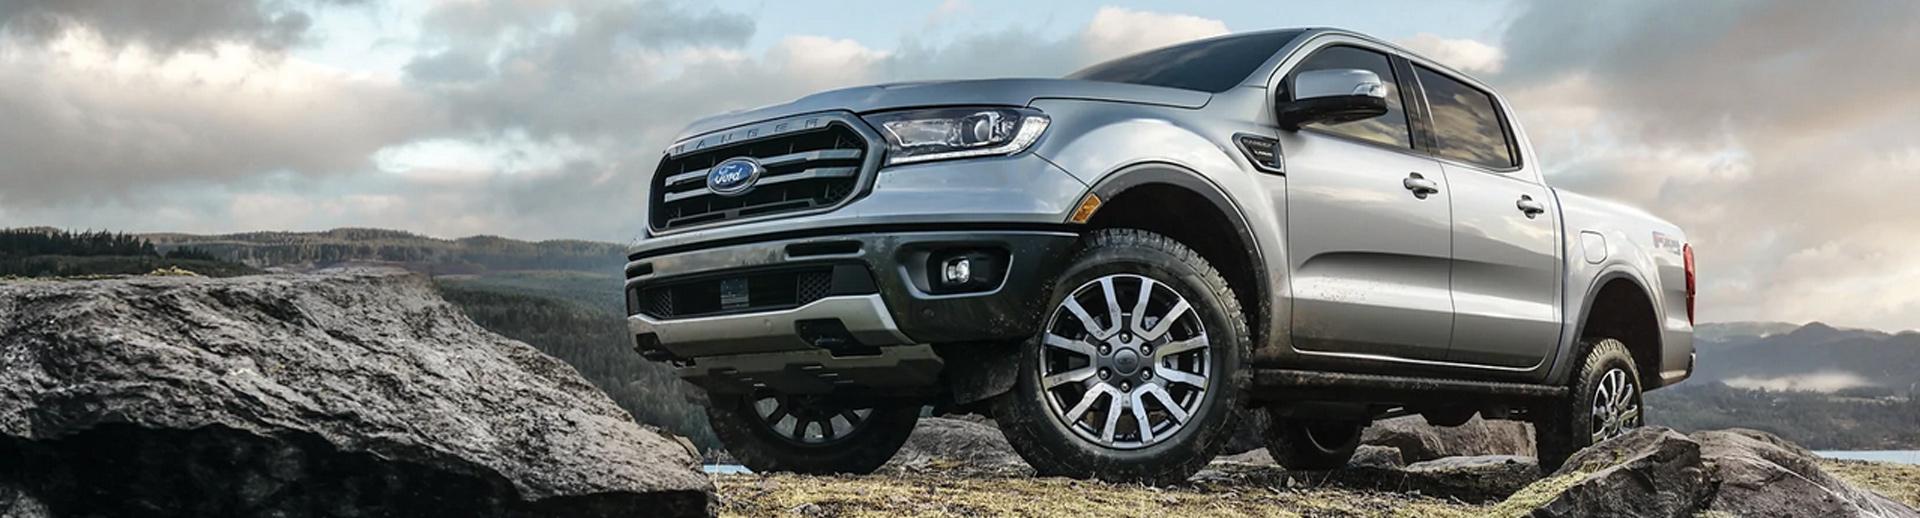 2021 Ford Ranger Lifestyle Photo